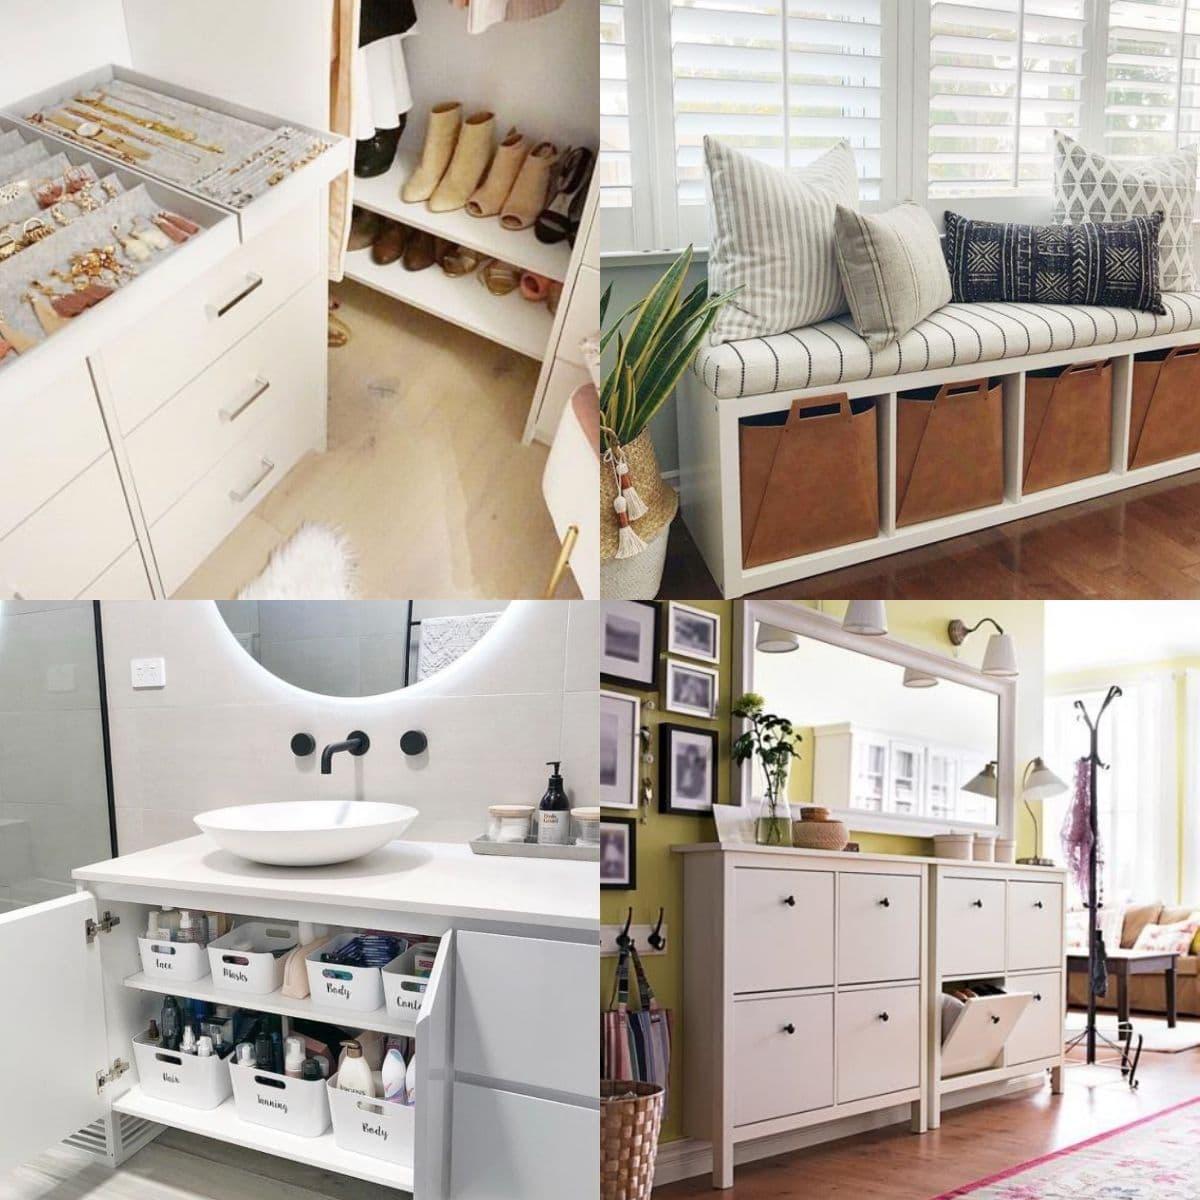 20 IKEA Hacks to Keep Things Organized   Craftsy Hacks